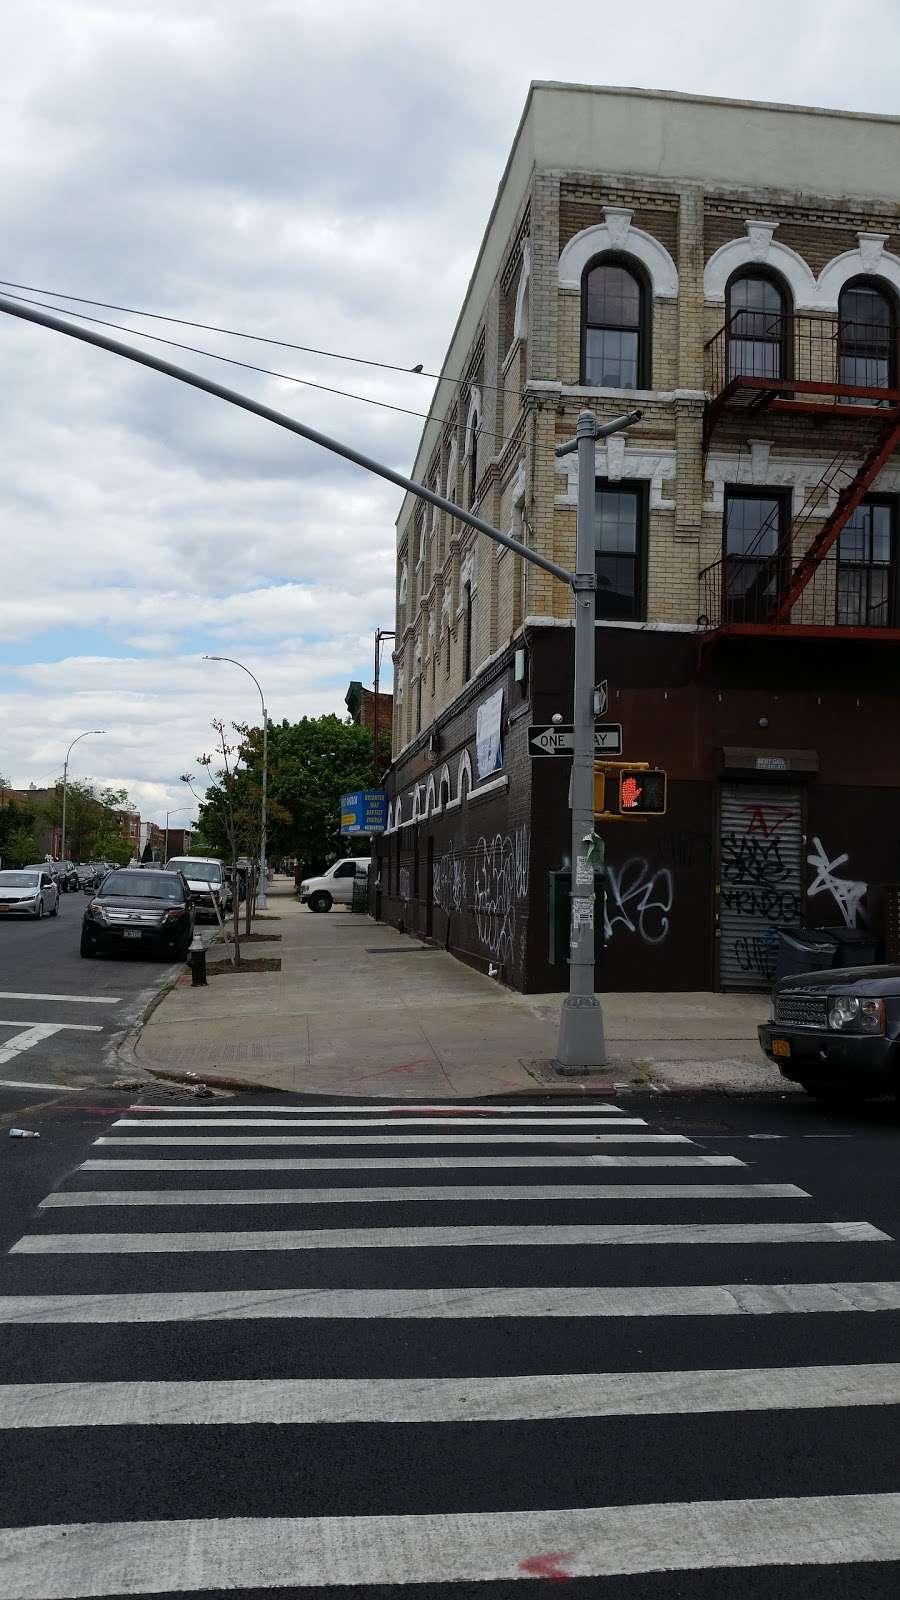 Brighter Way Baptist Church - church  | Photo 2 of 2 | Address: 417 Throop Ave # 1, Brooklyn, NY 11221, USA | Phone: (718) 573-1058